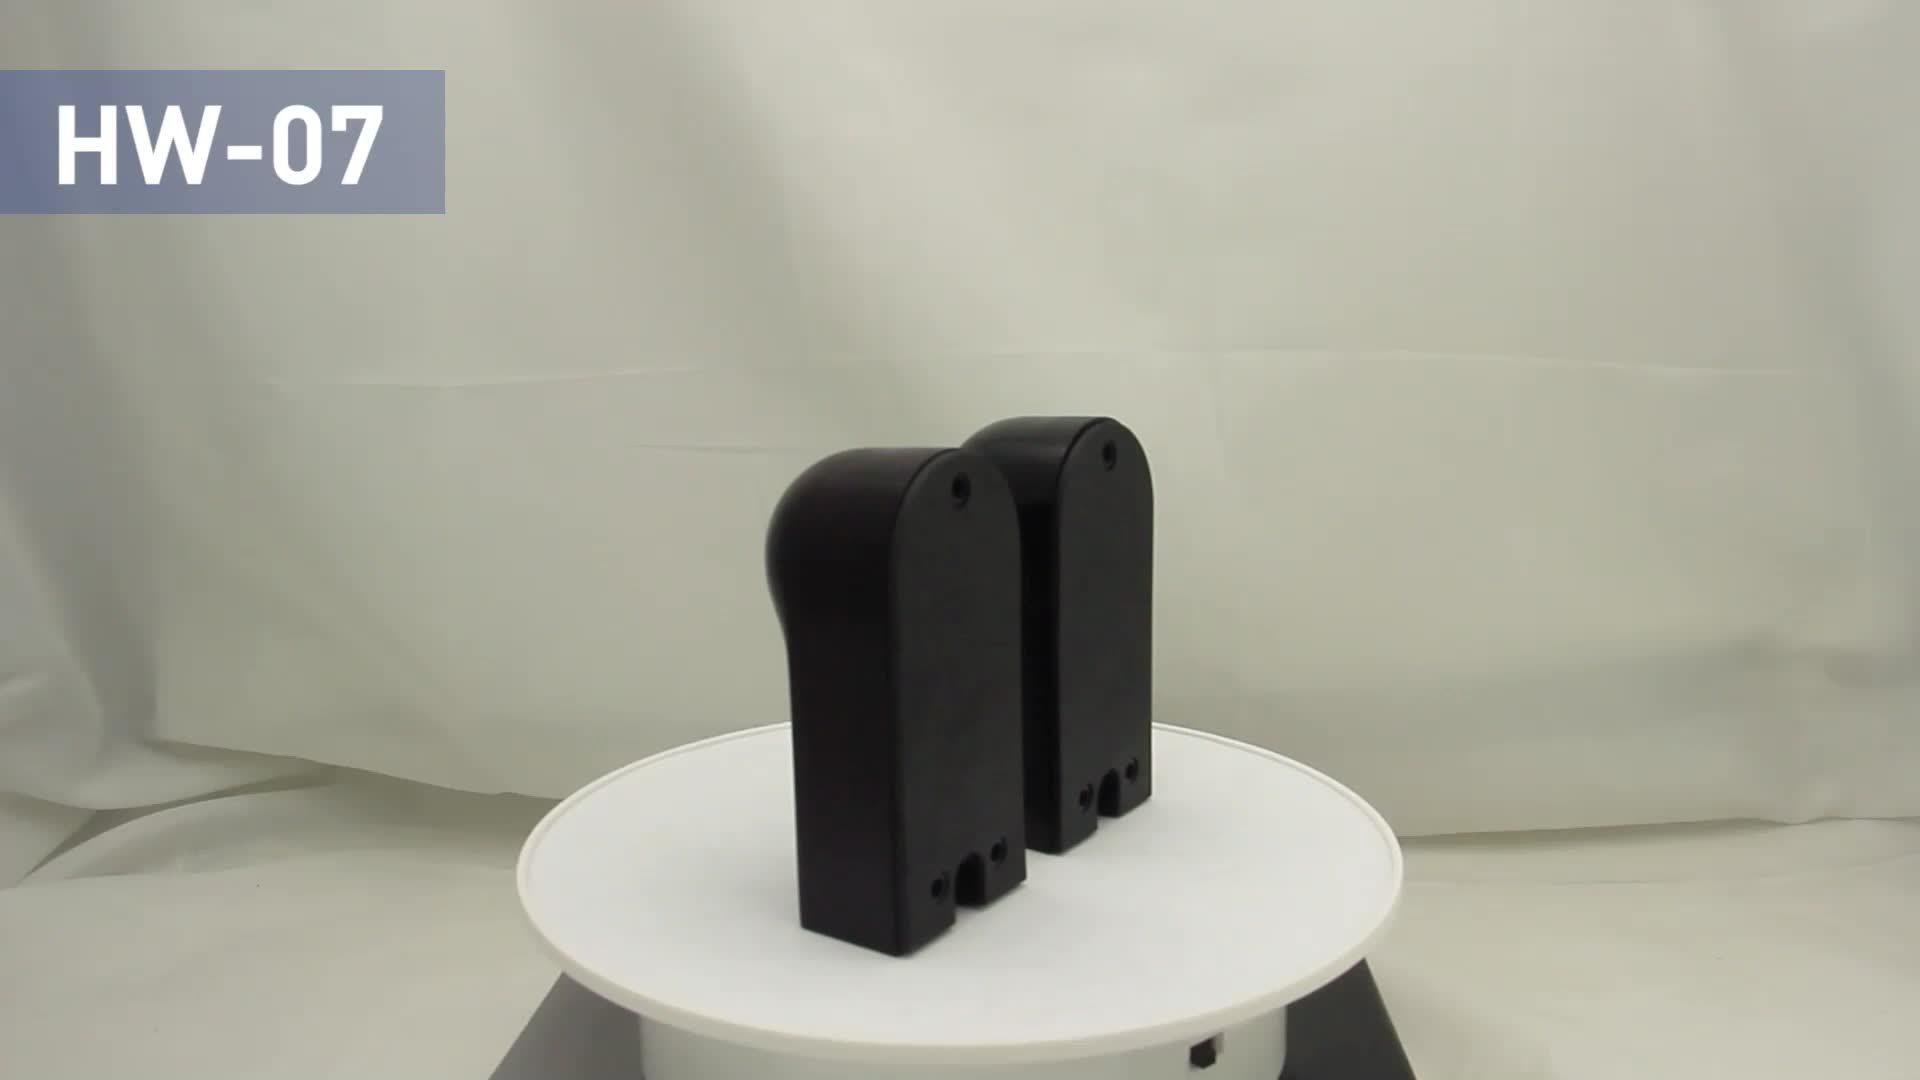 12V-24V DC/AV систем безопасности отражатель фотоэлемент